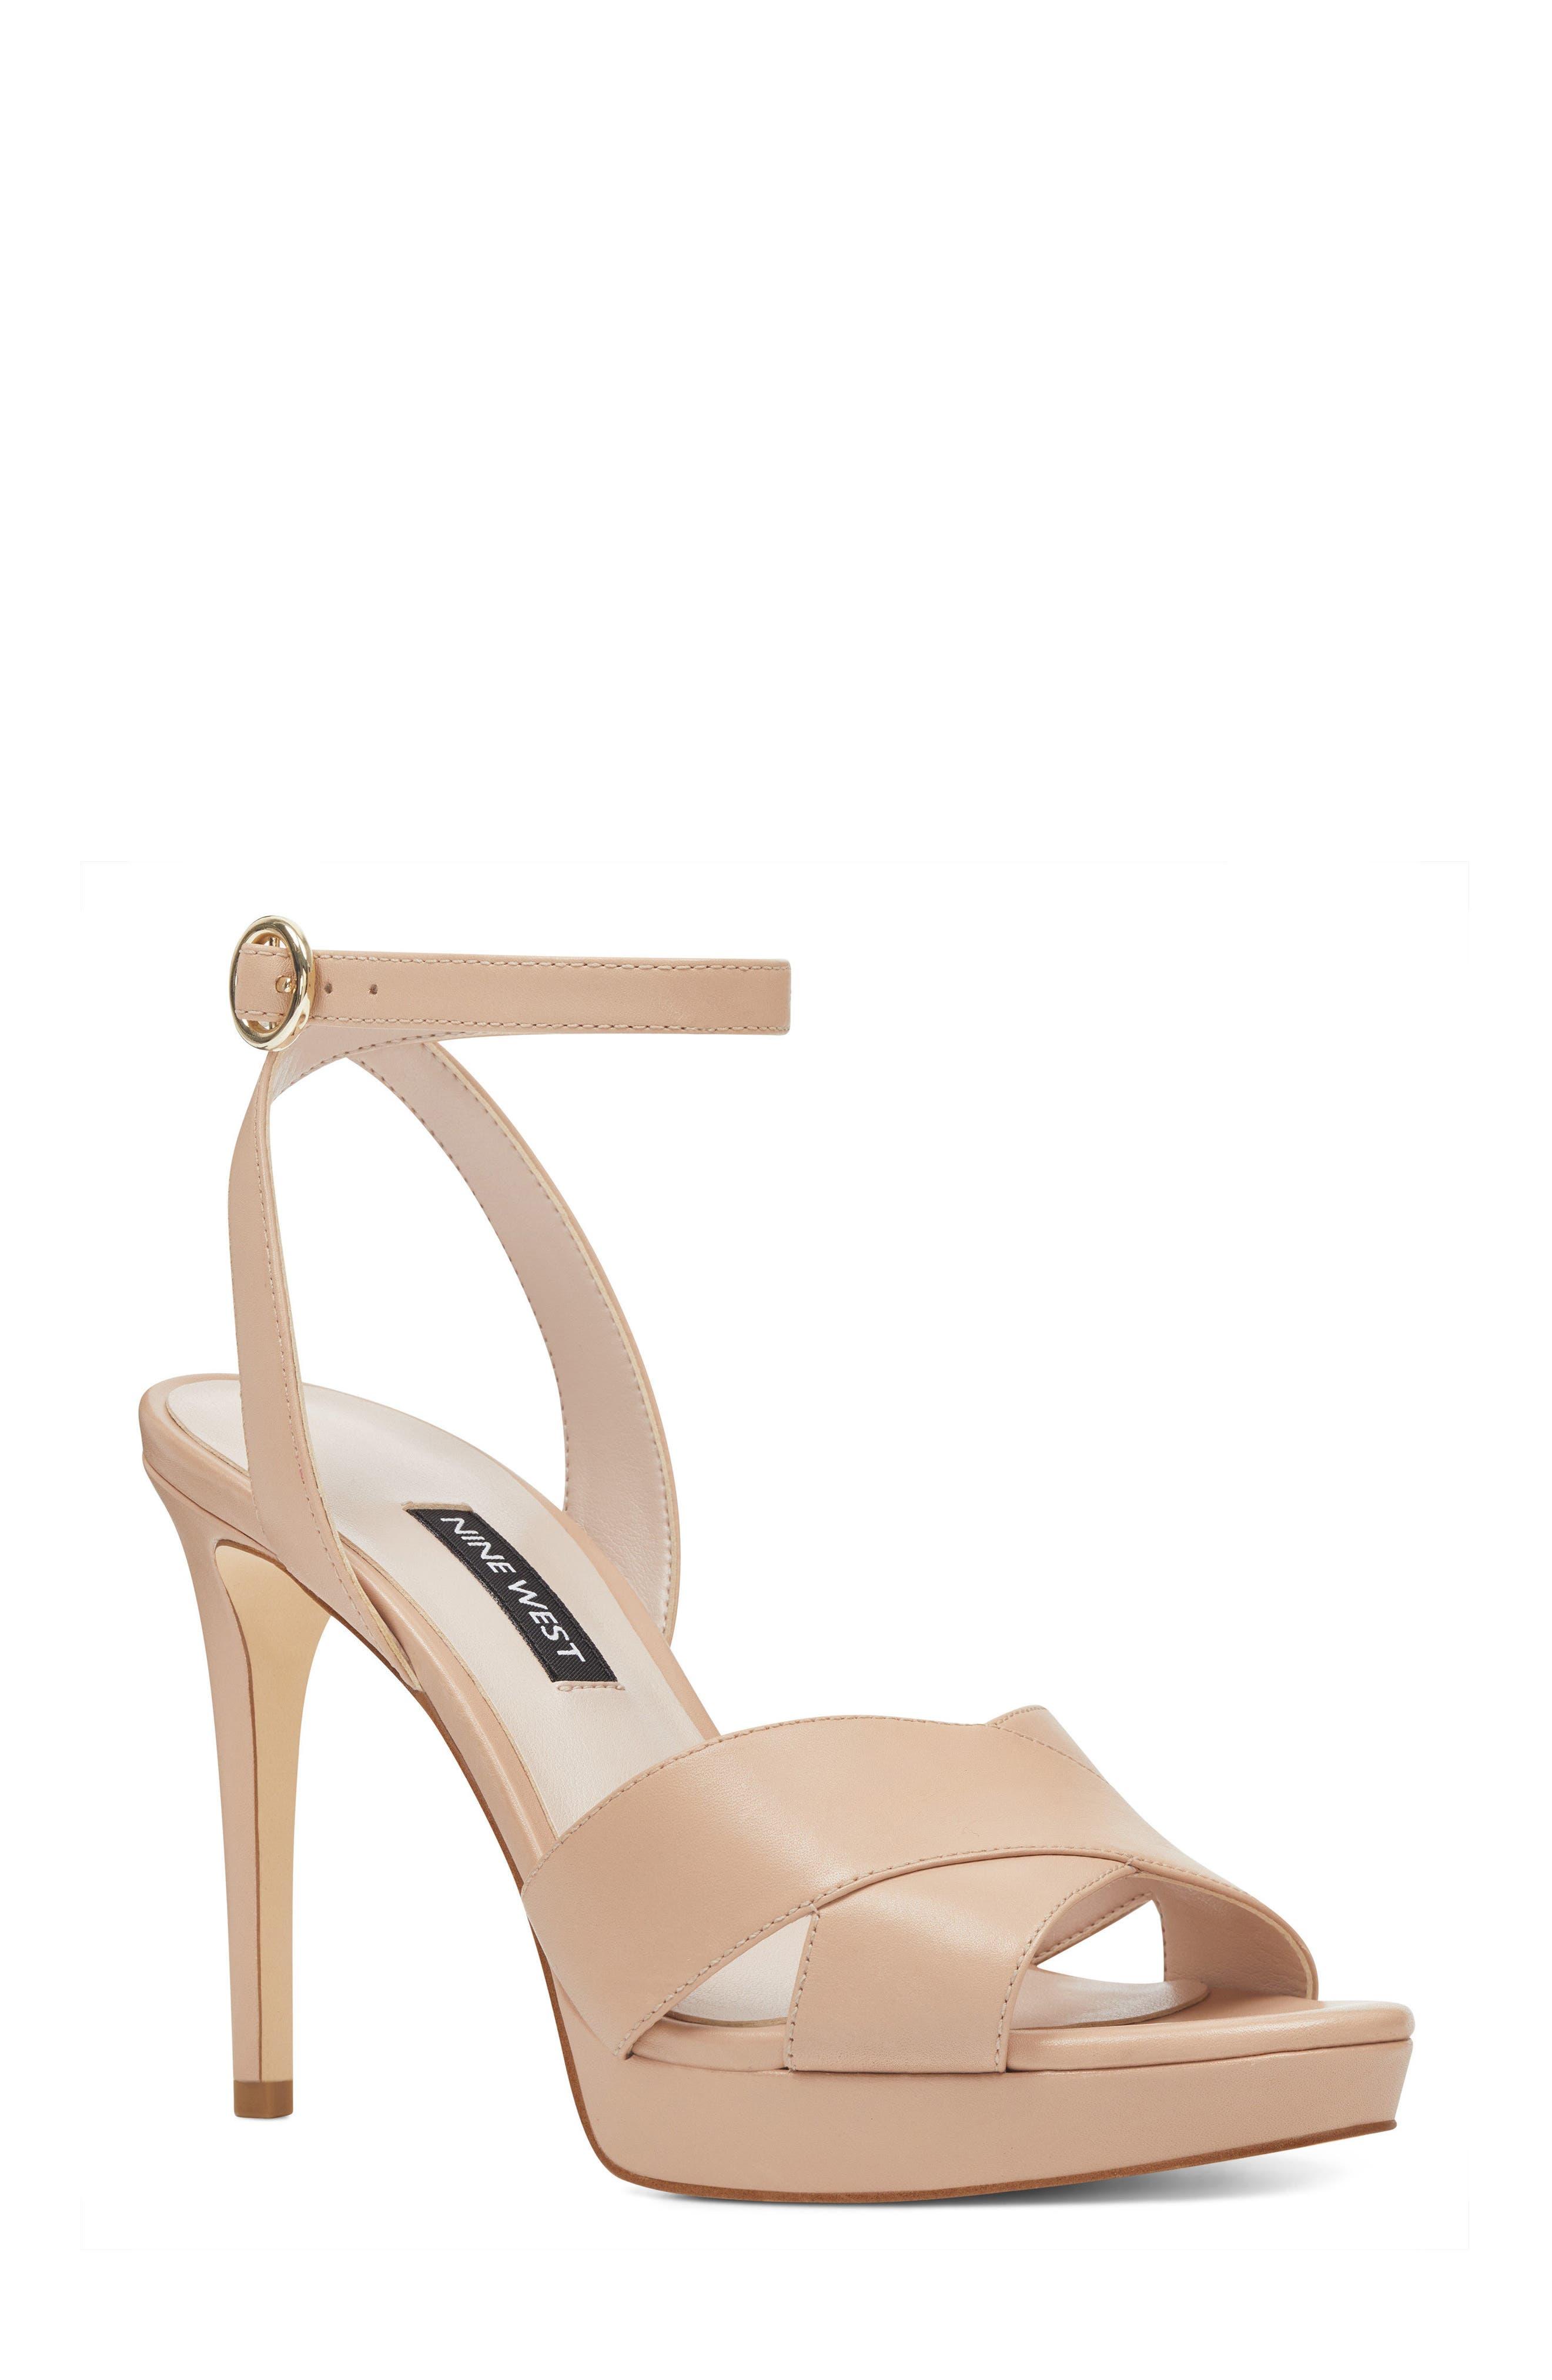 Quisha Ankle Strap Sandal,                         Main,                         color, LIGHT NATURAL LEATHER